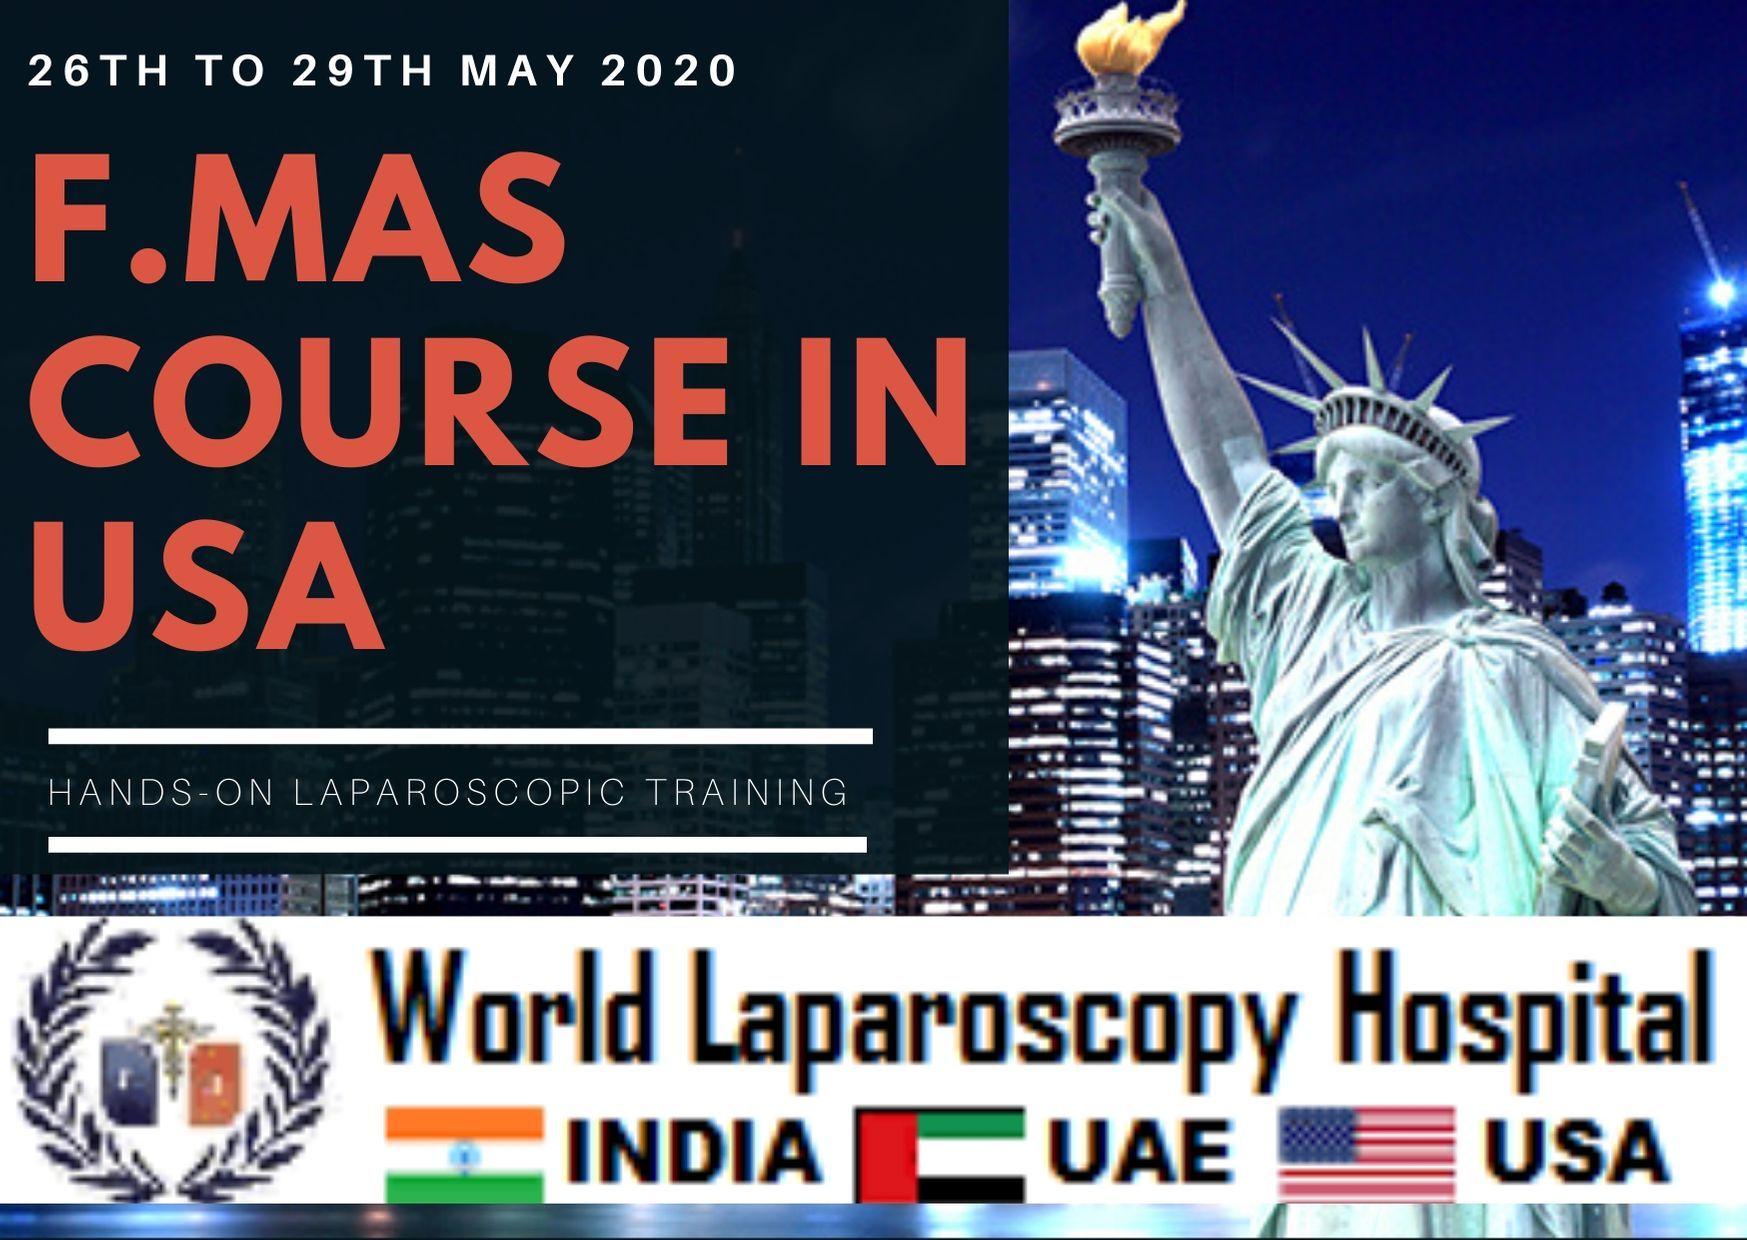 Laparoscopic Training in USA